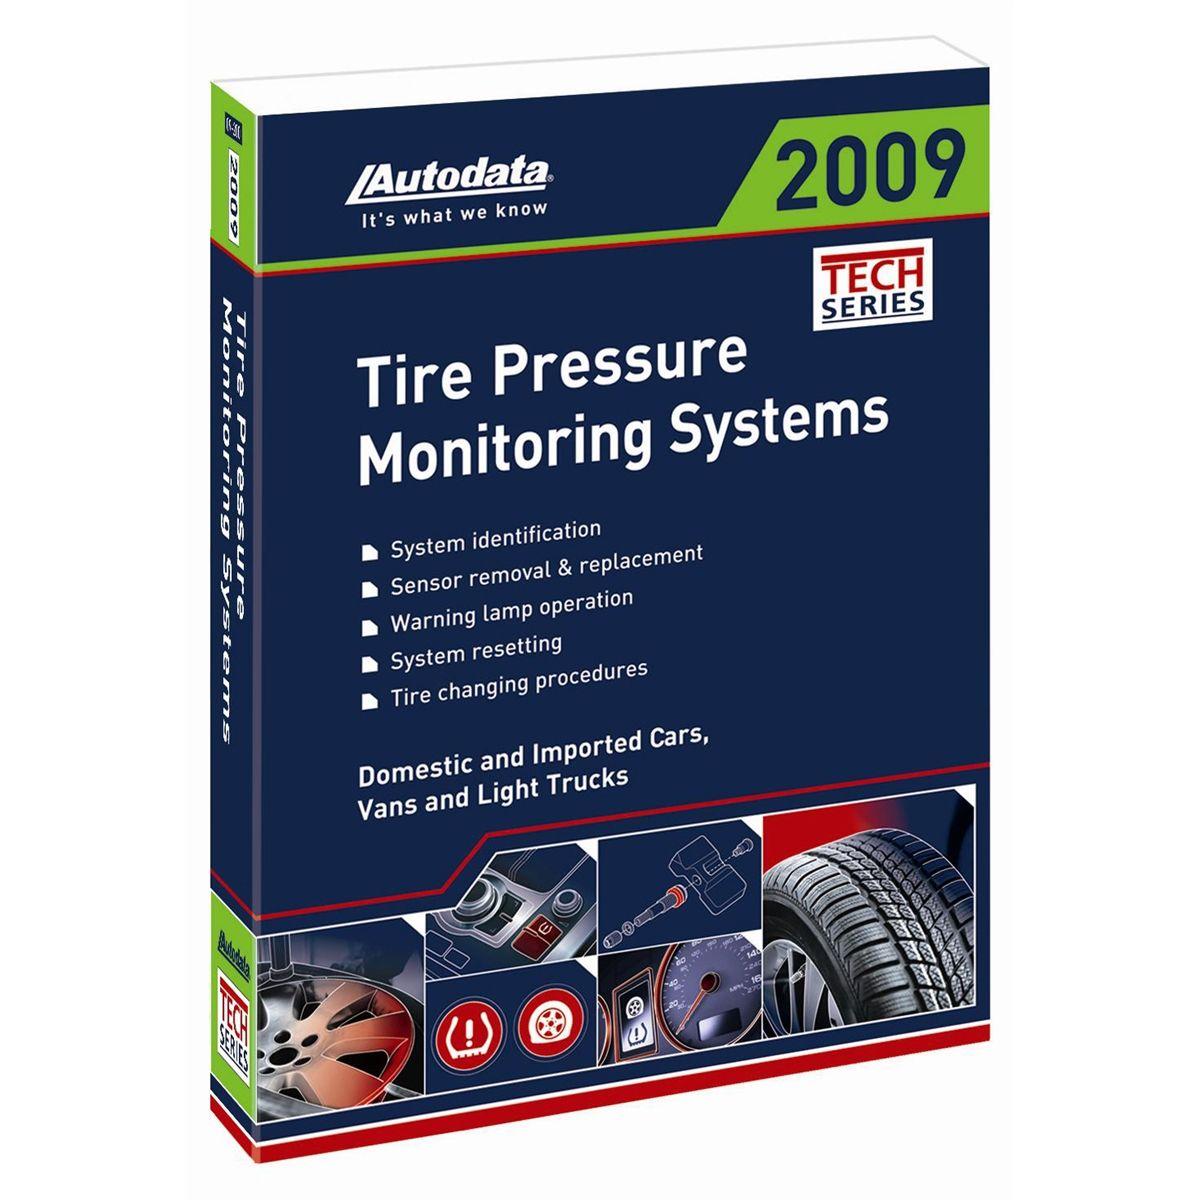 autodata pub 09 200 2009 tire pressure monitoring system manual adt09 200. Black Bedroom Furniture Sets. Home Design Ideas